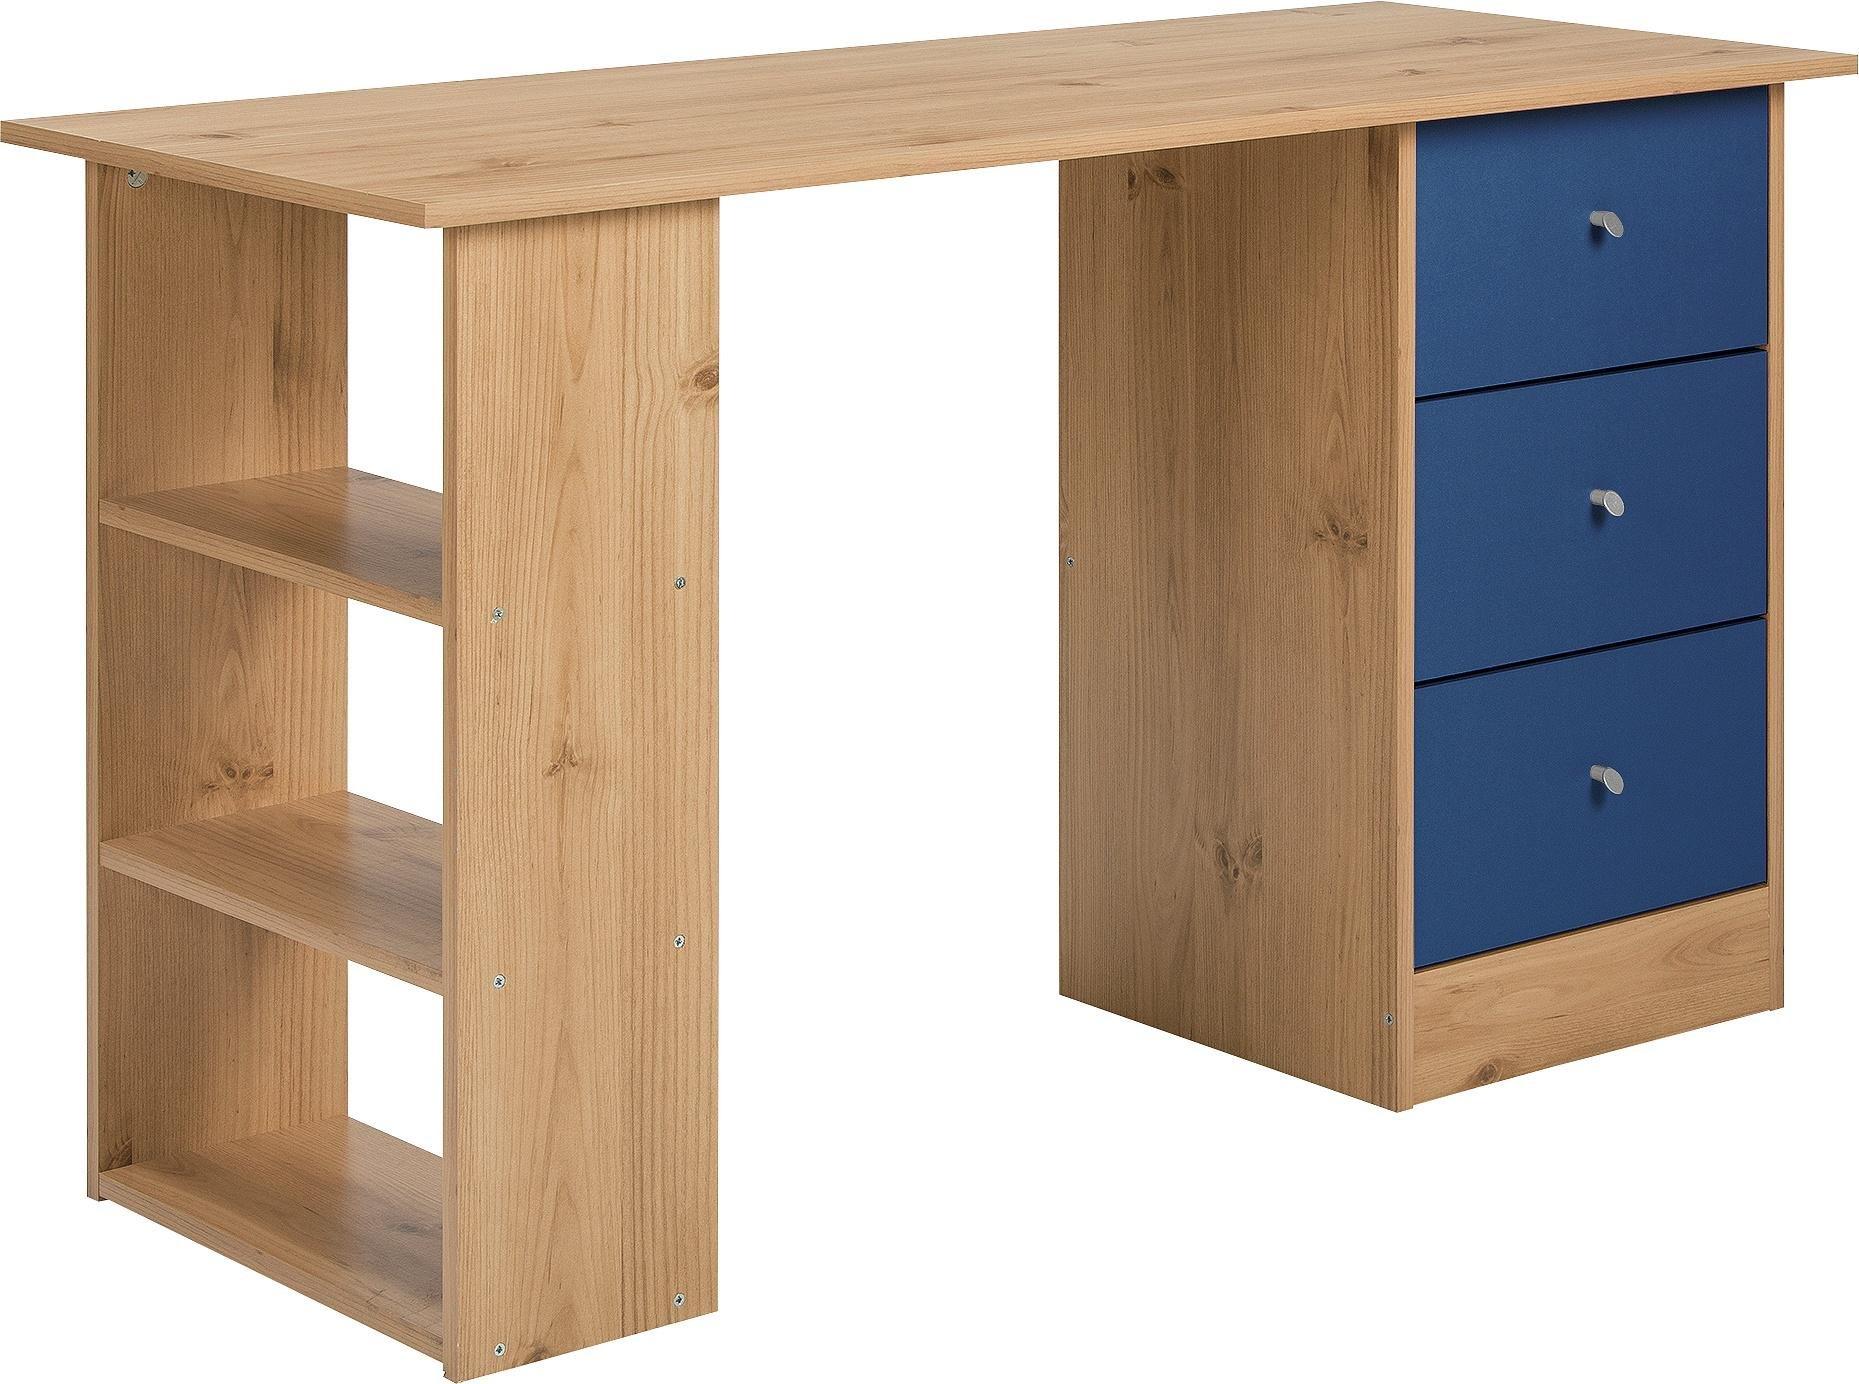 childrens office chair. HOME Kids New Malibu 3 Drawer Desk - Blue On Pine Childrens Office Chair S